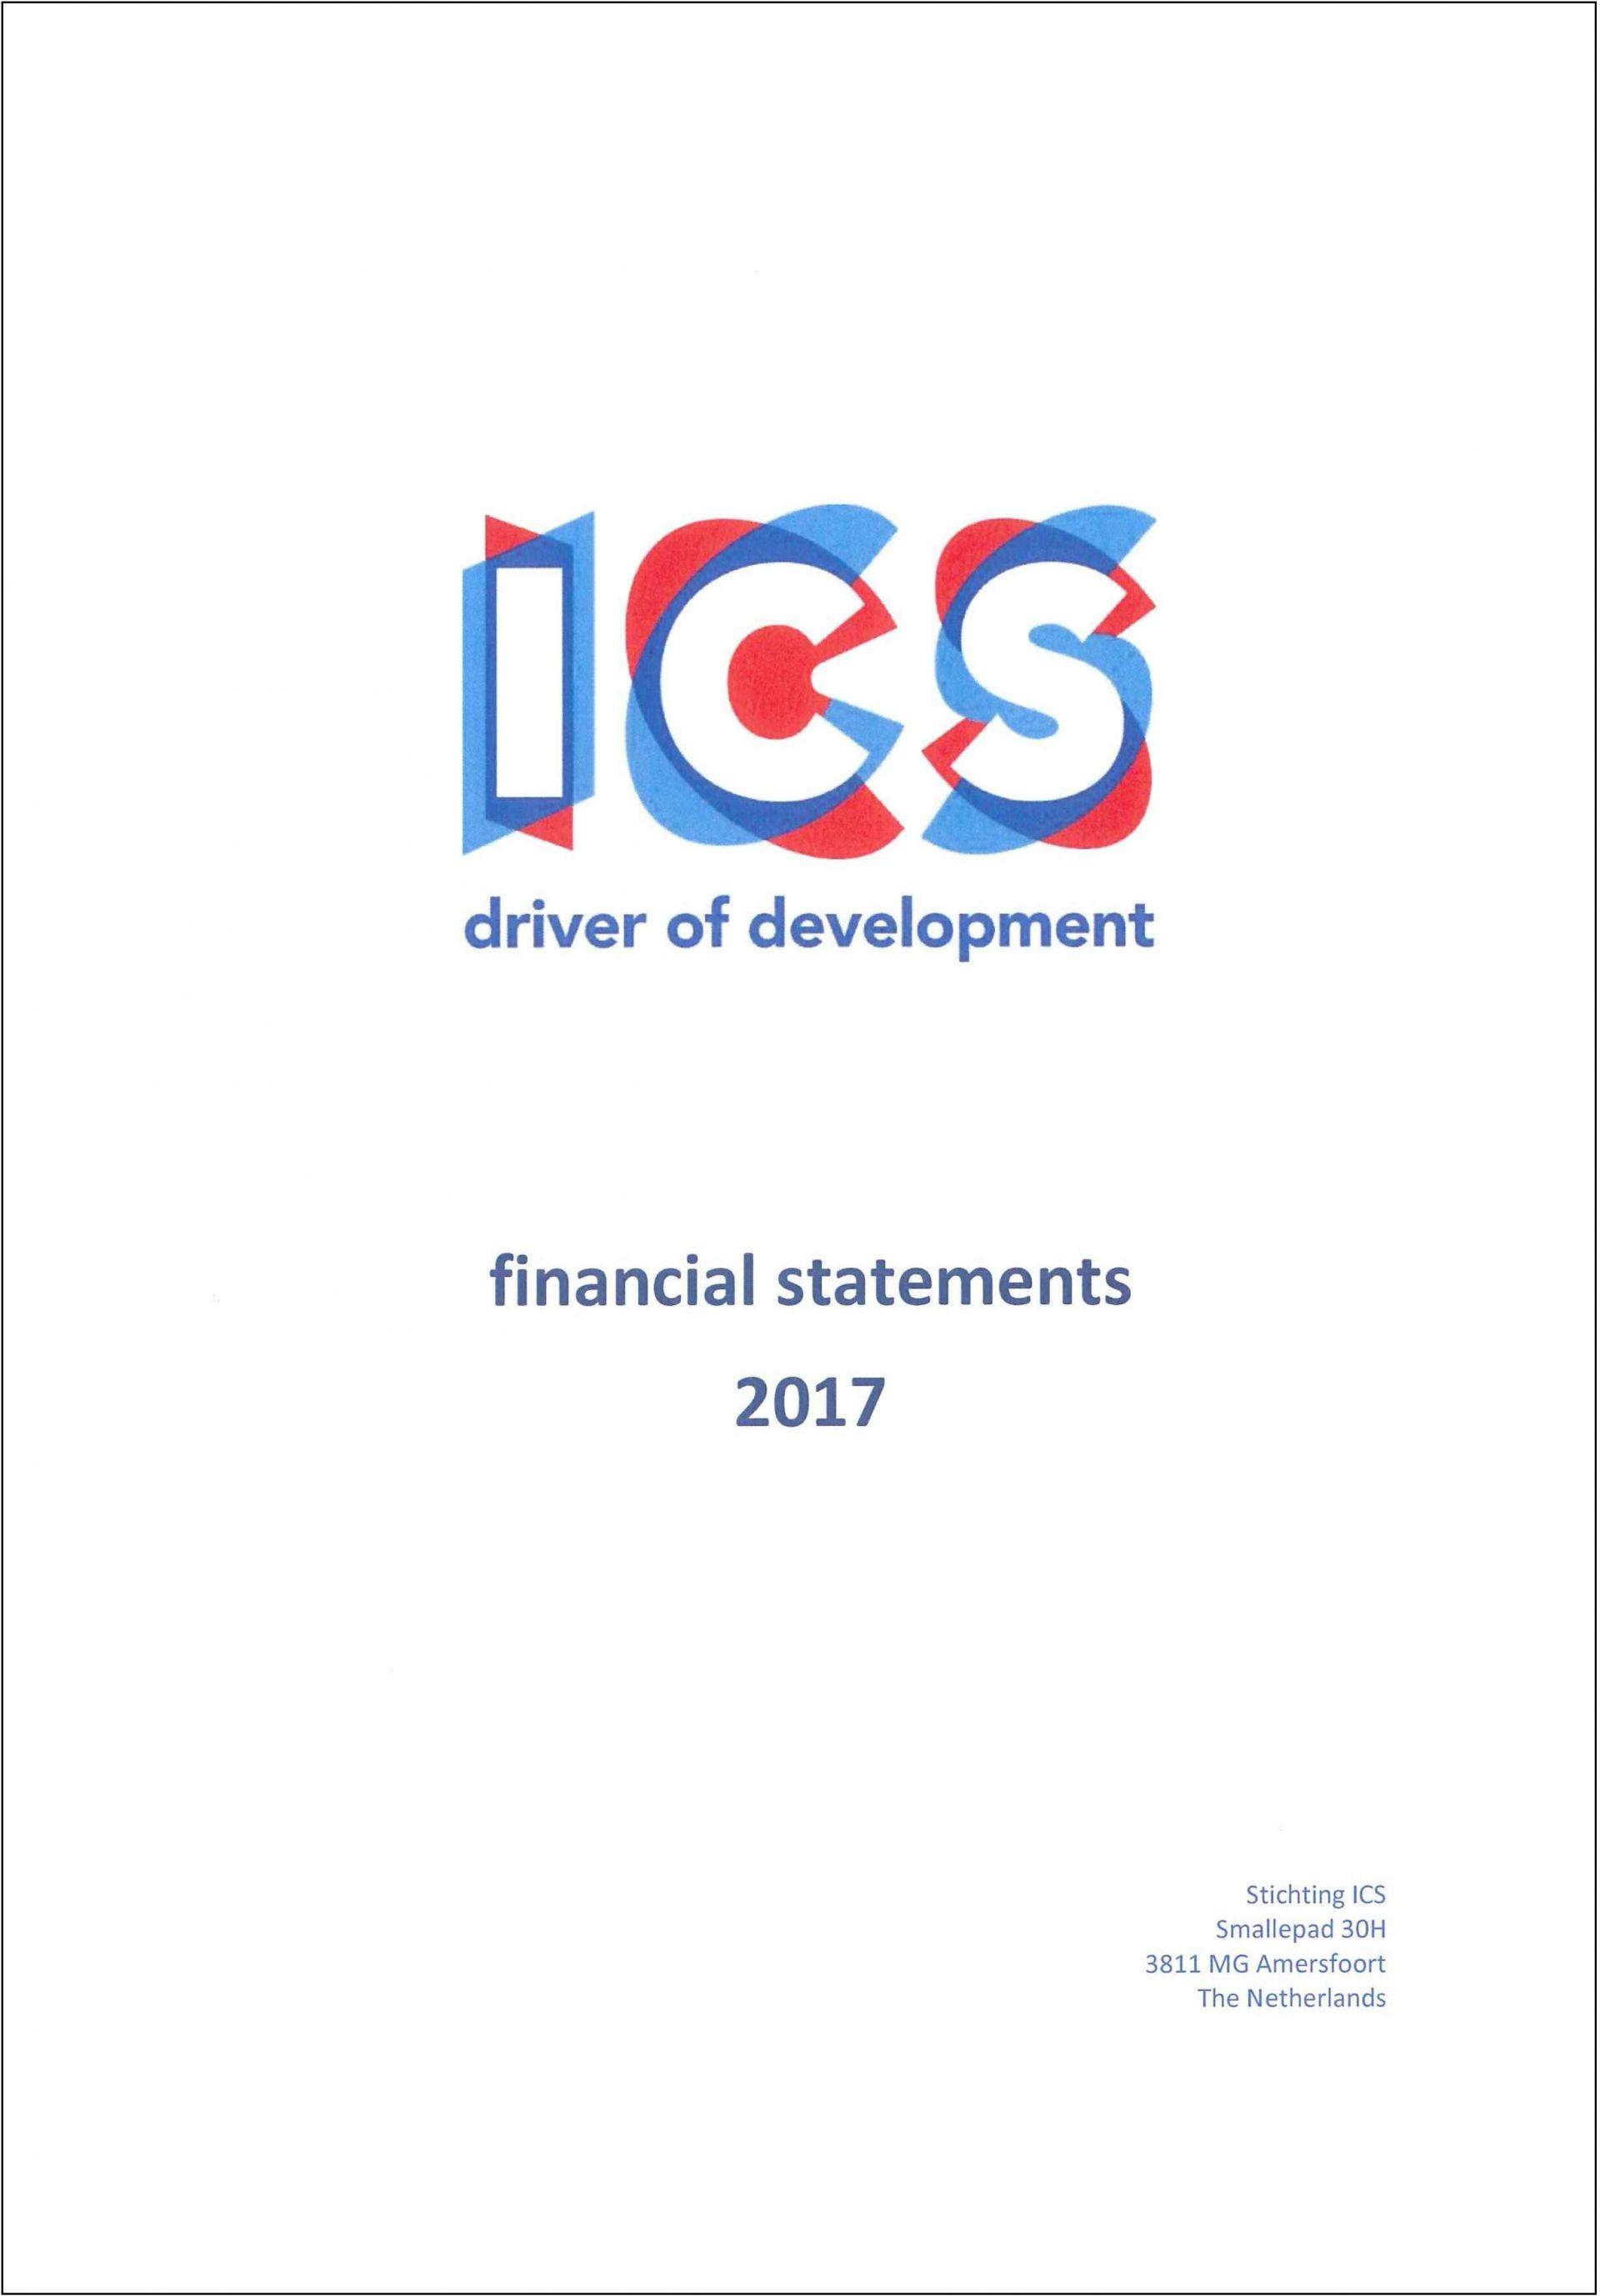 St%20ICS%20-%20voorblad%20financial%20statements.jpg